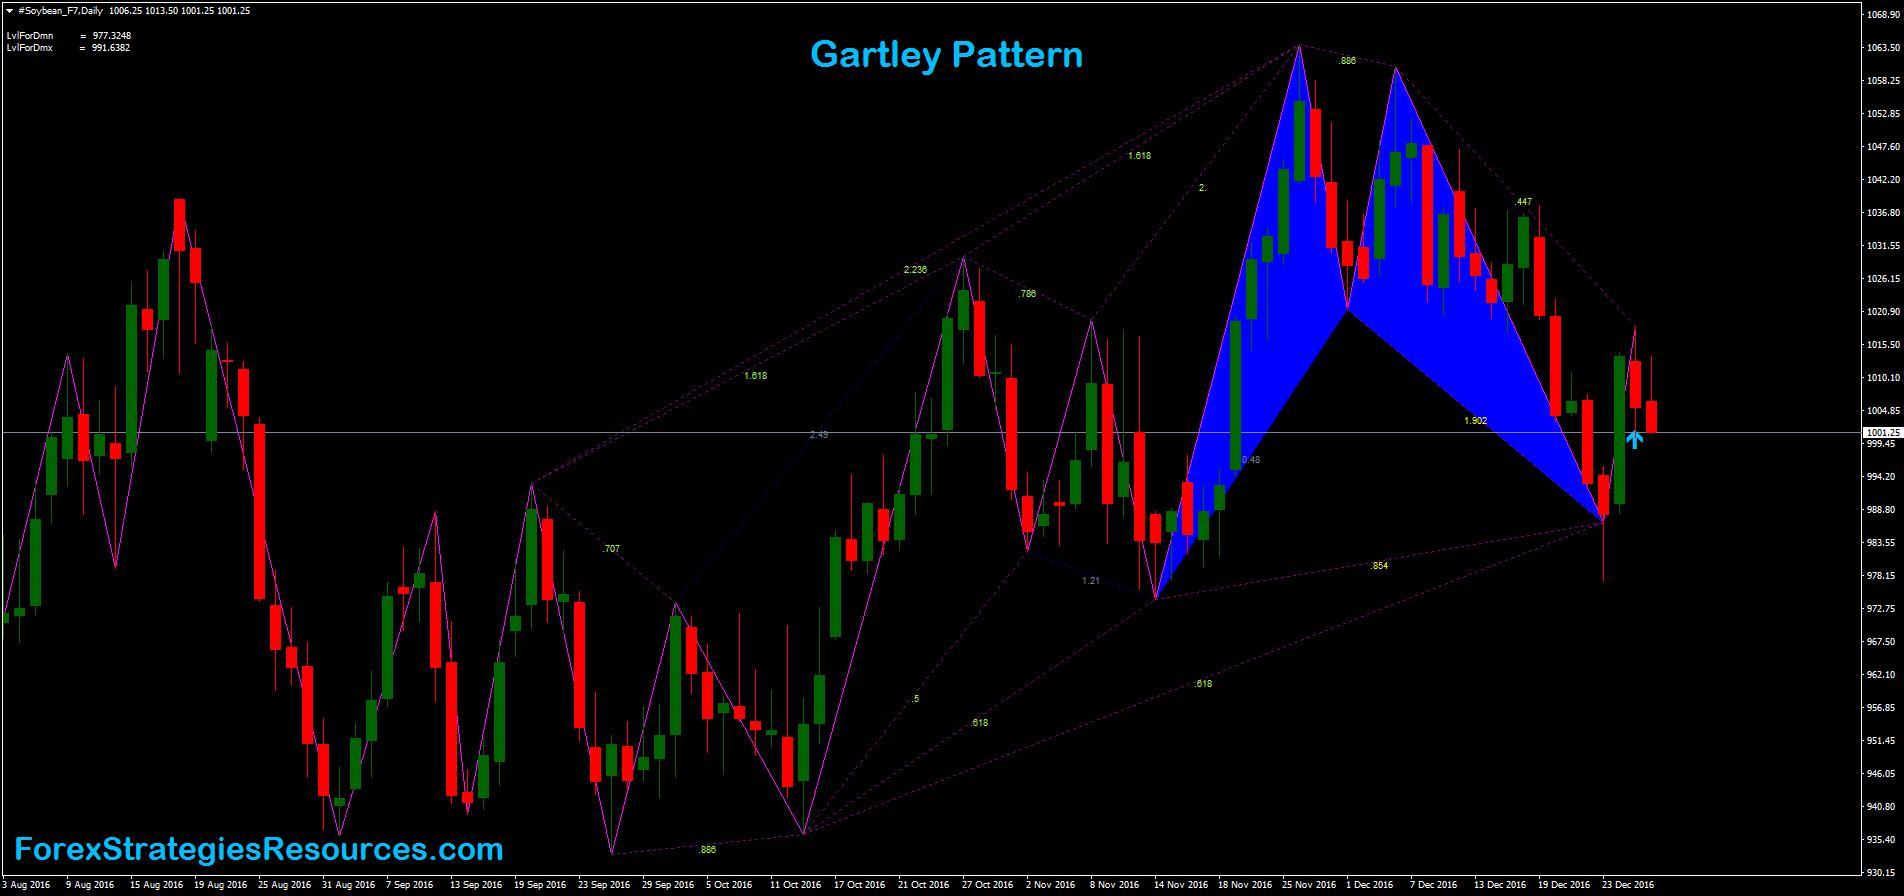 modele Gartley pentru opțiuni binare indicatori profitabili opțiuni binare